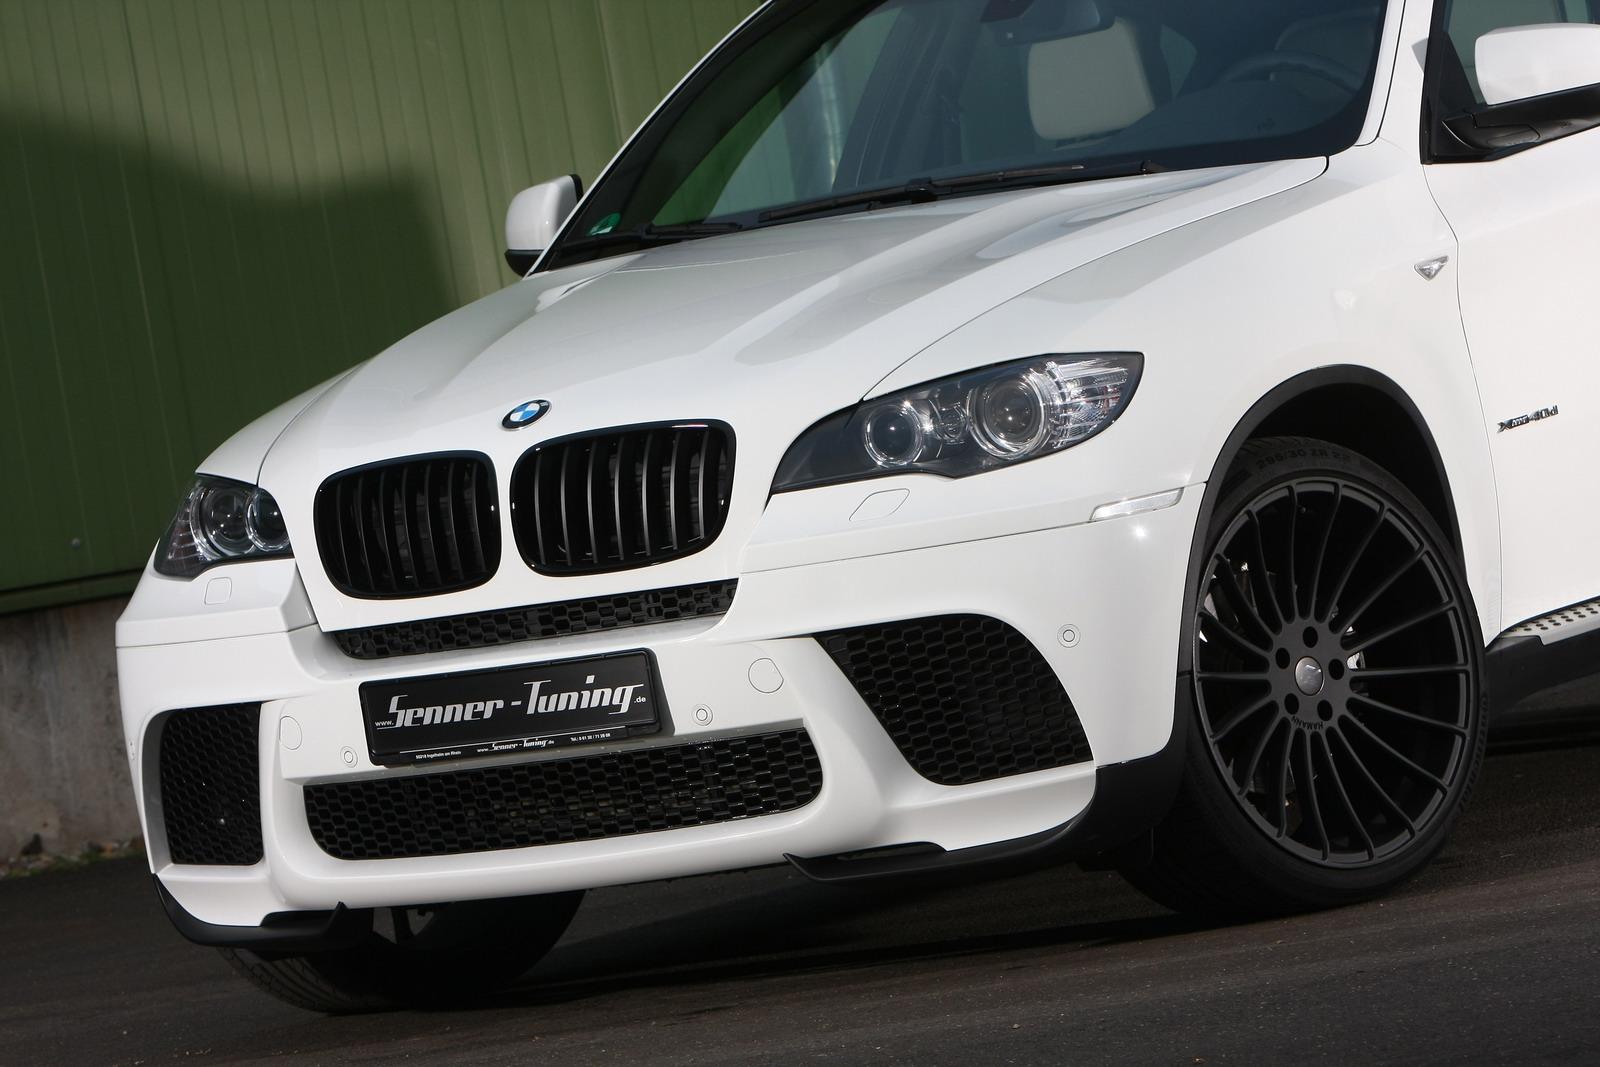 Naftové BMW X6 od Senner Tuning 3